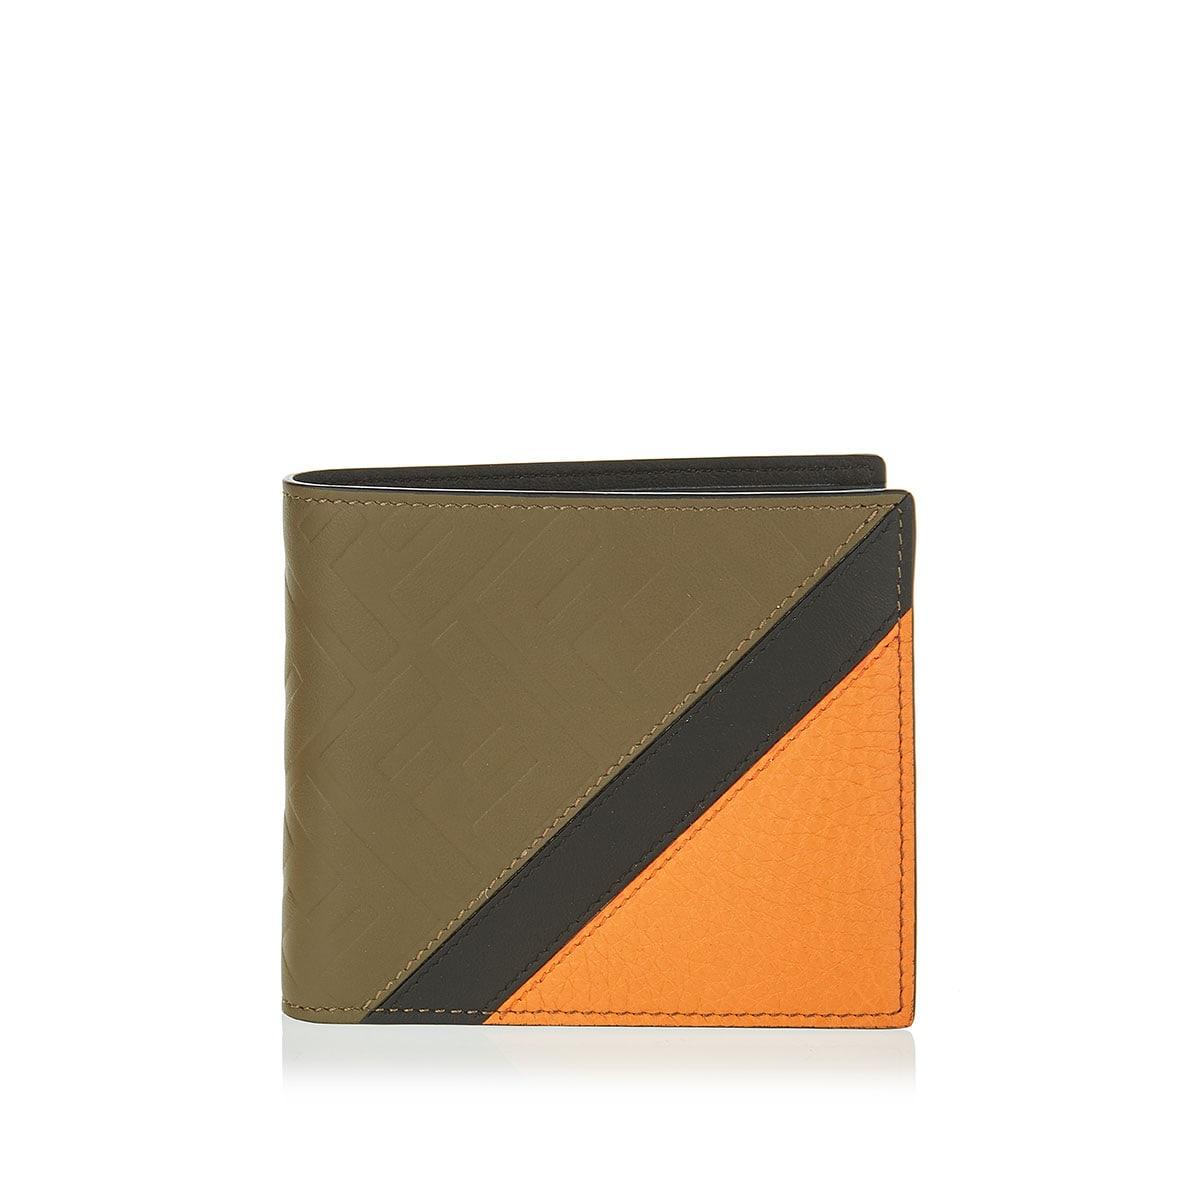 FF leather bi-fold wallet